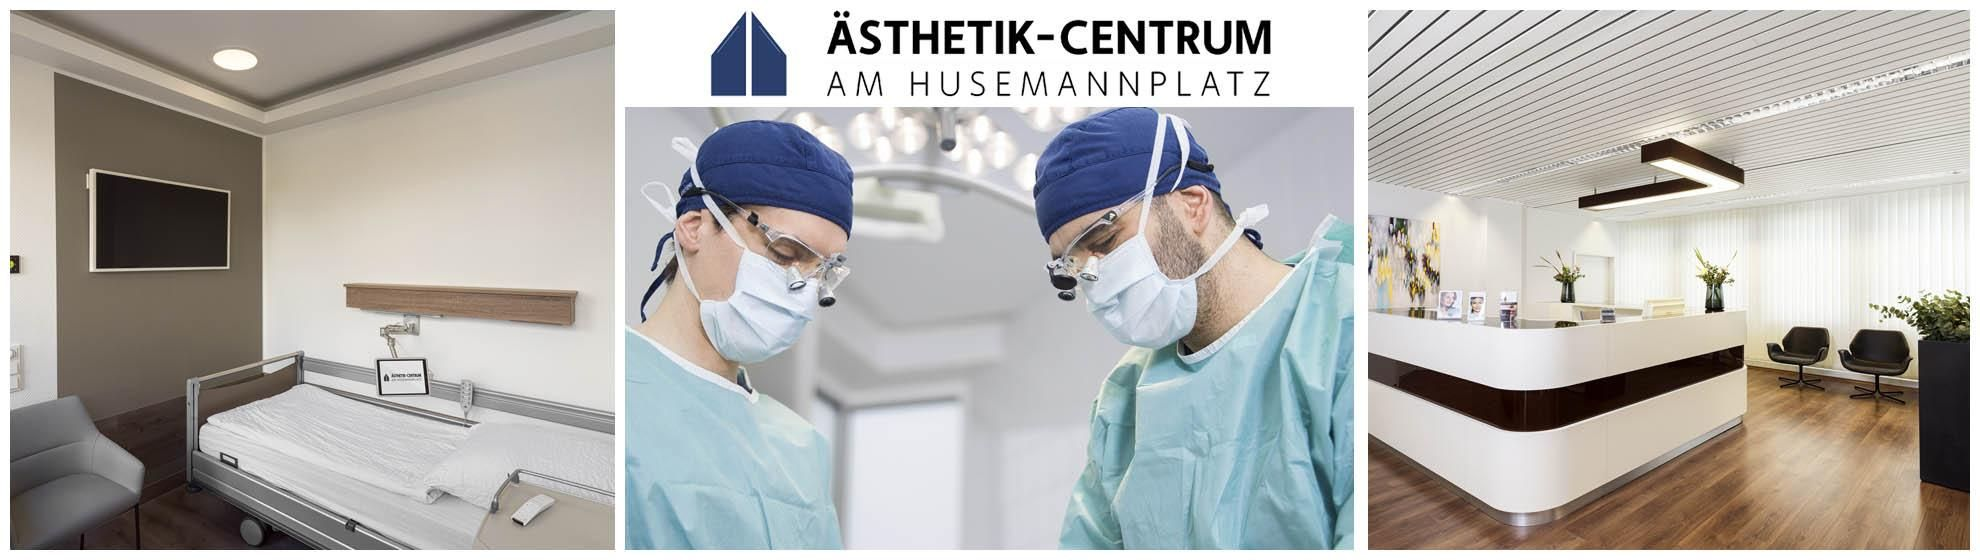 Ästhetik-Centrum am Husemannplatz